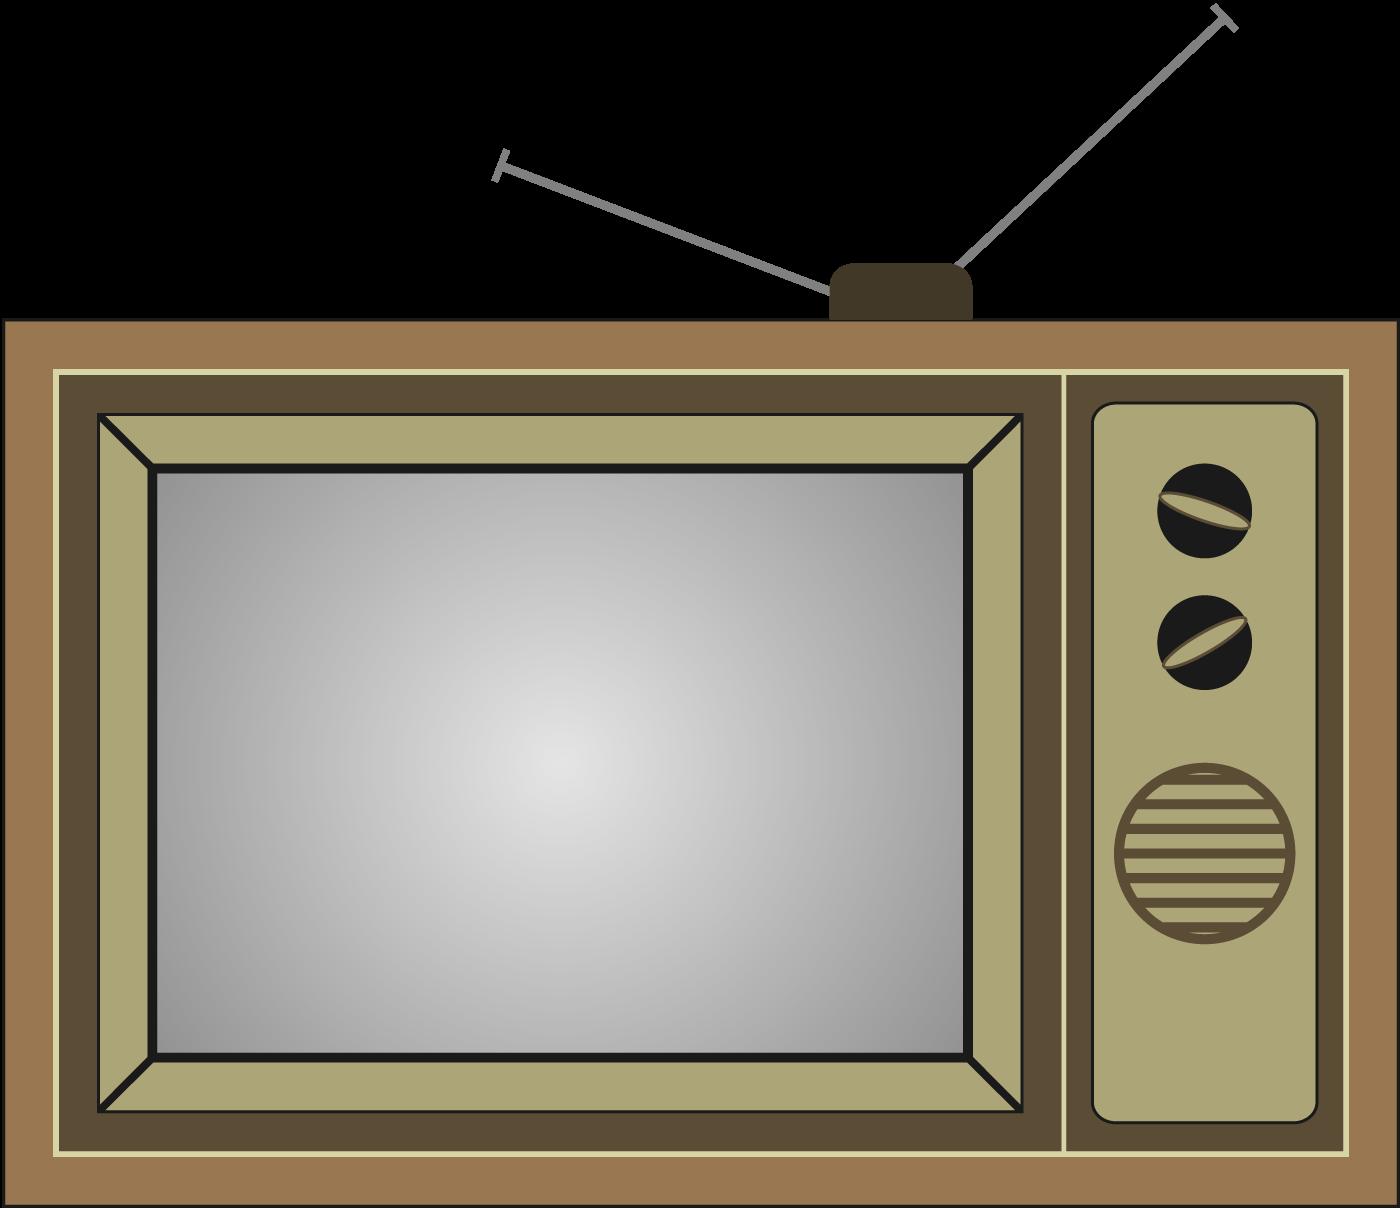 hooker-&-company-broadcasting-design-tv-set